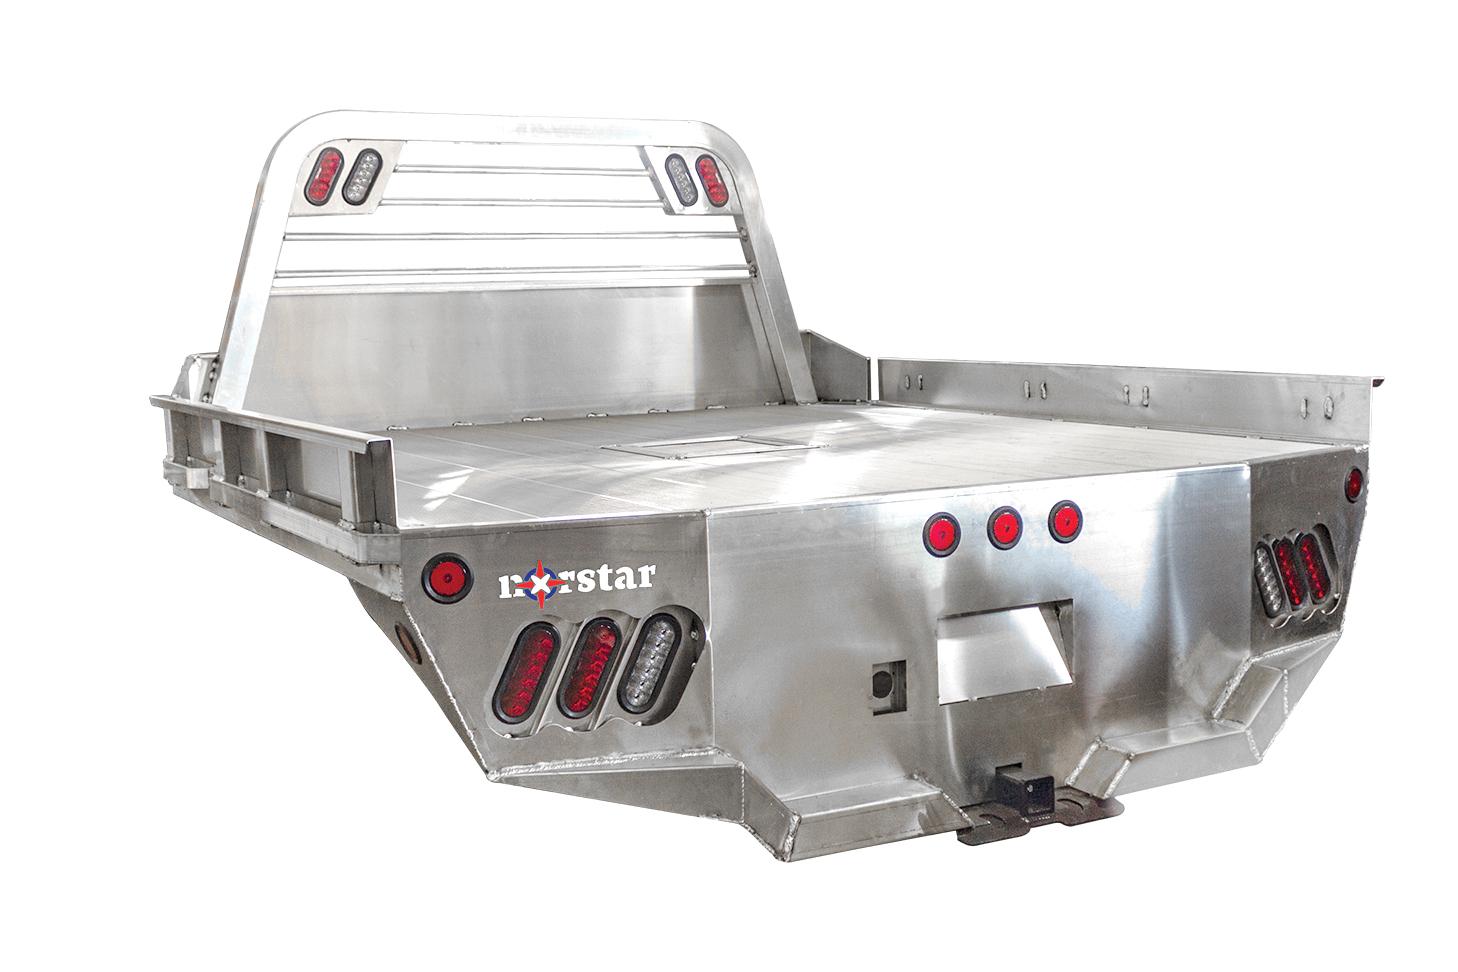 Norstar AR - Aluminum Flatbed